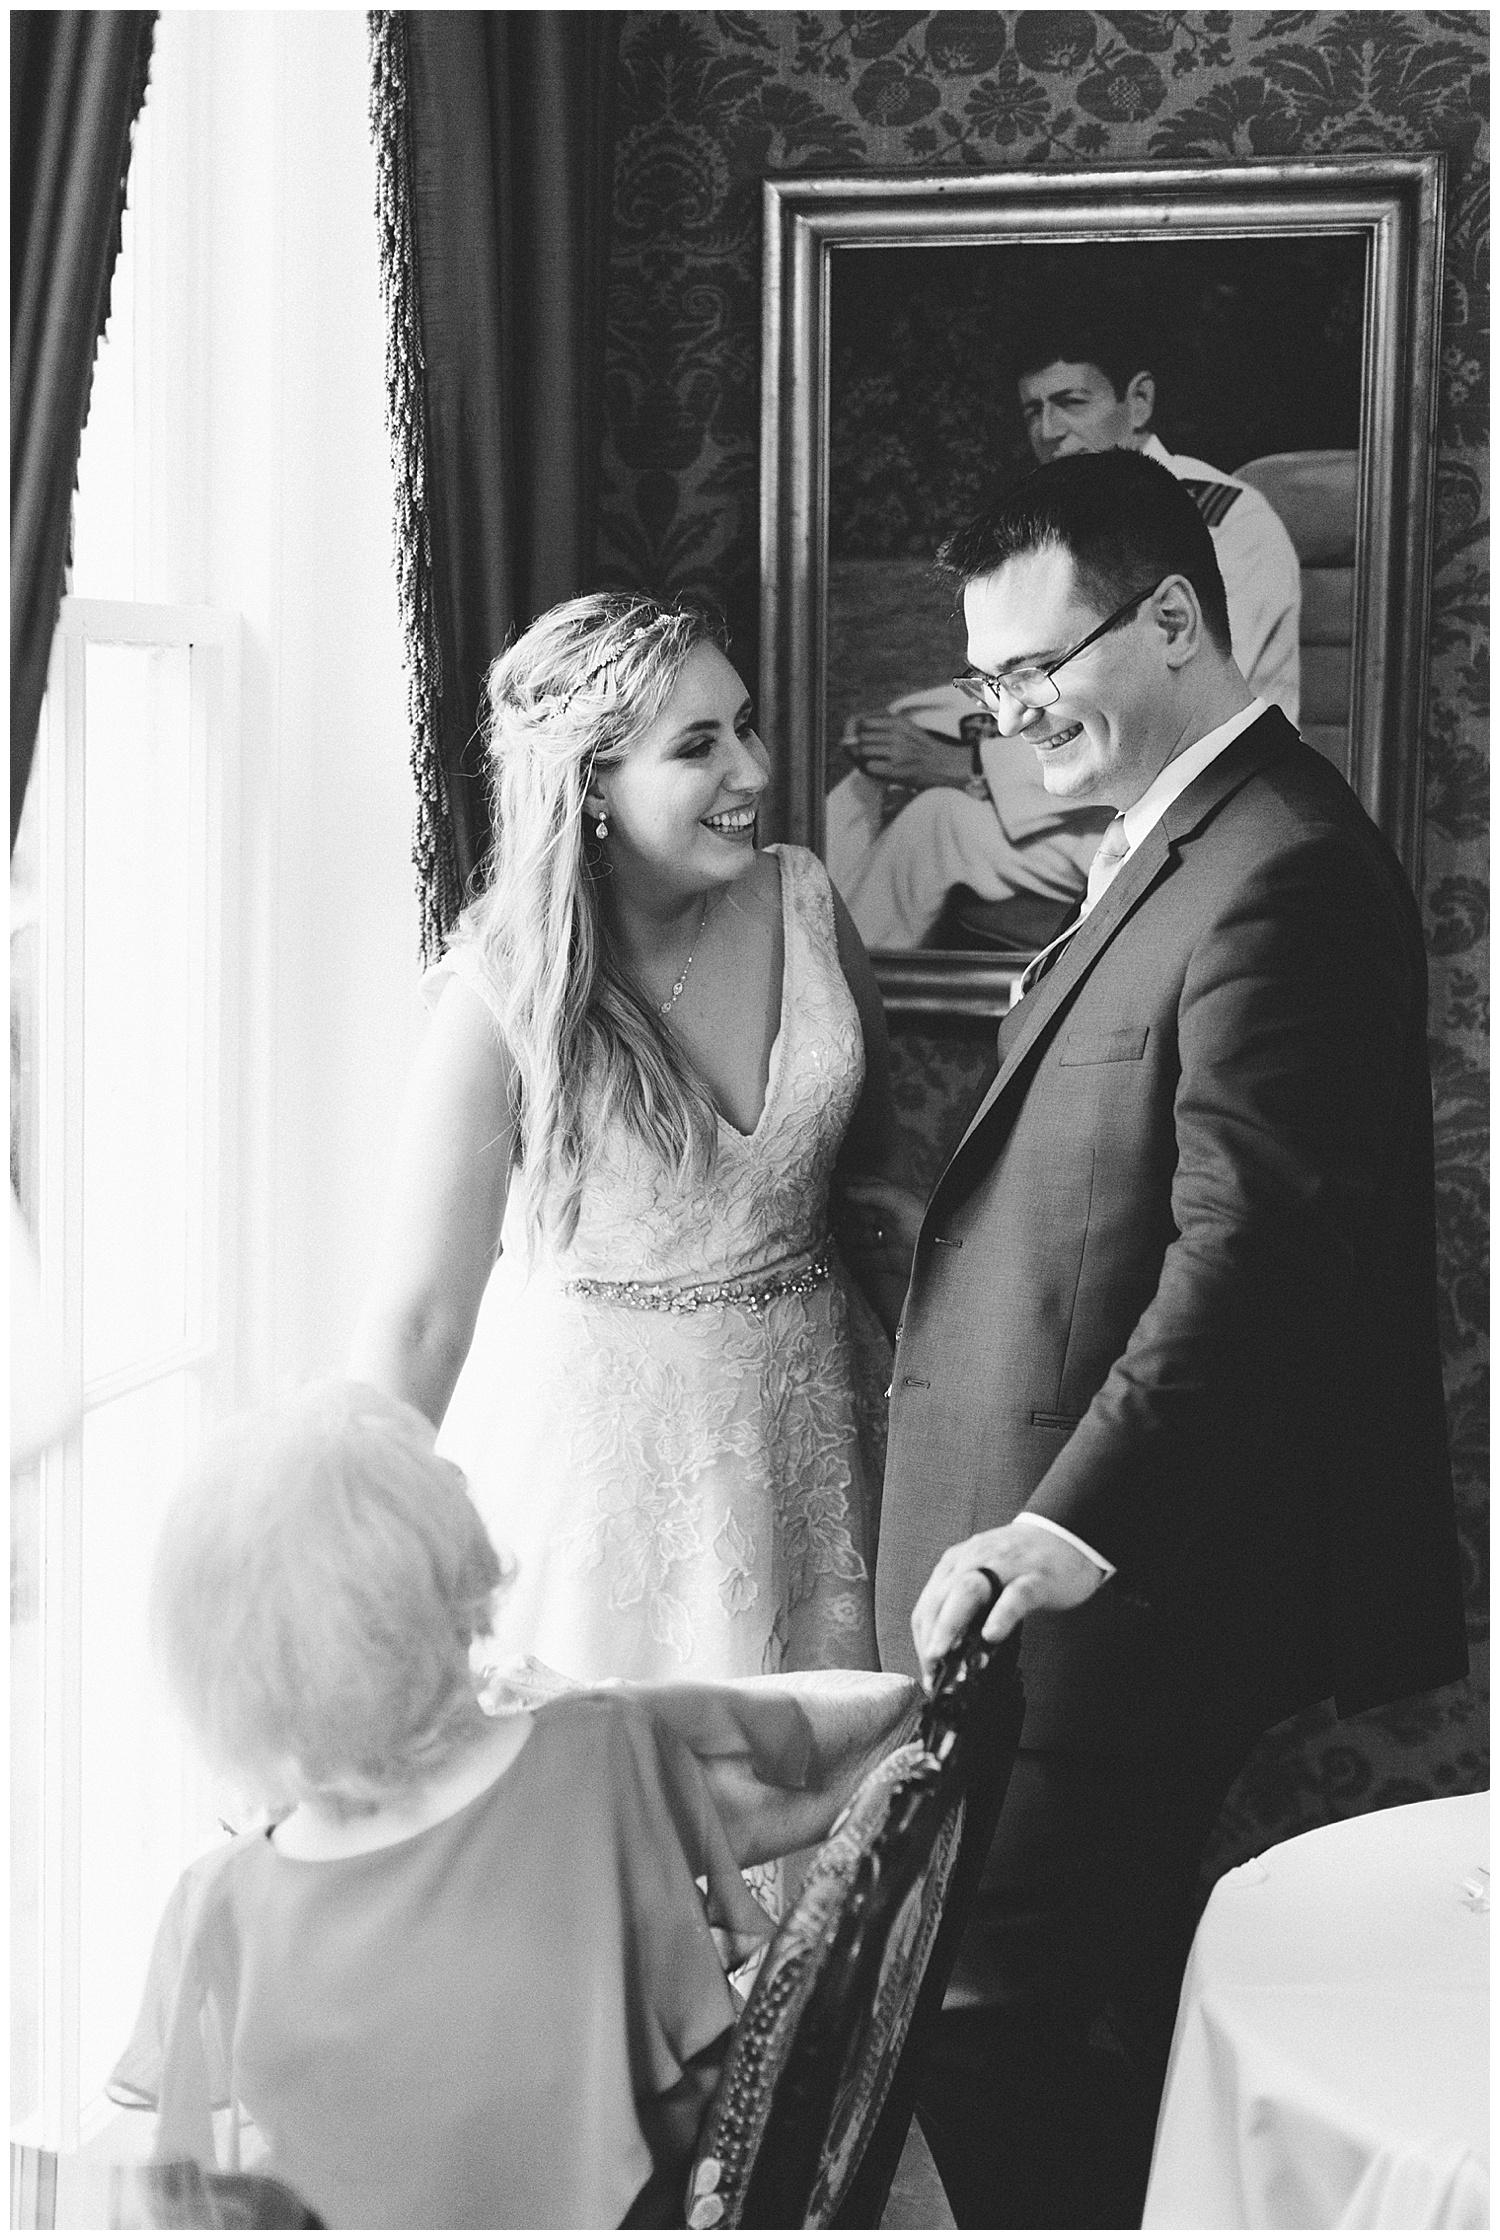 trent.and.kendra.photography.whitehall.wedding-172.jpg